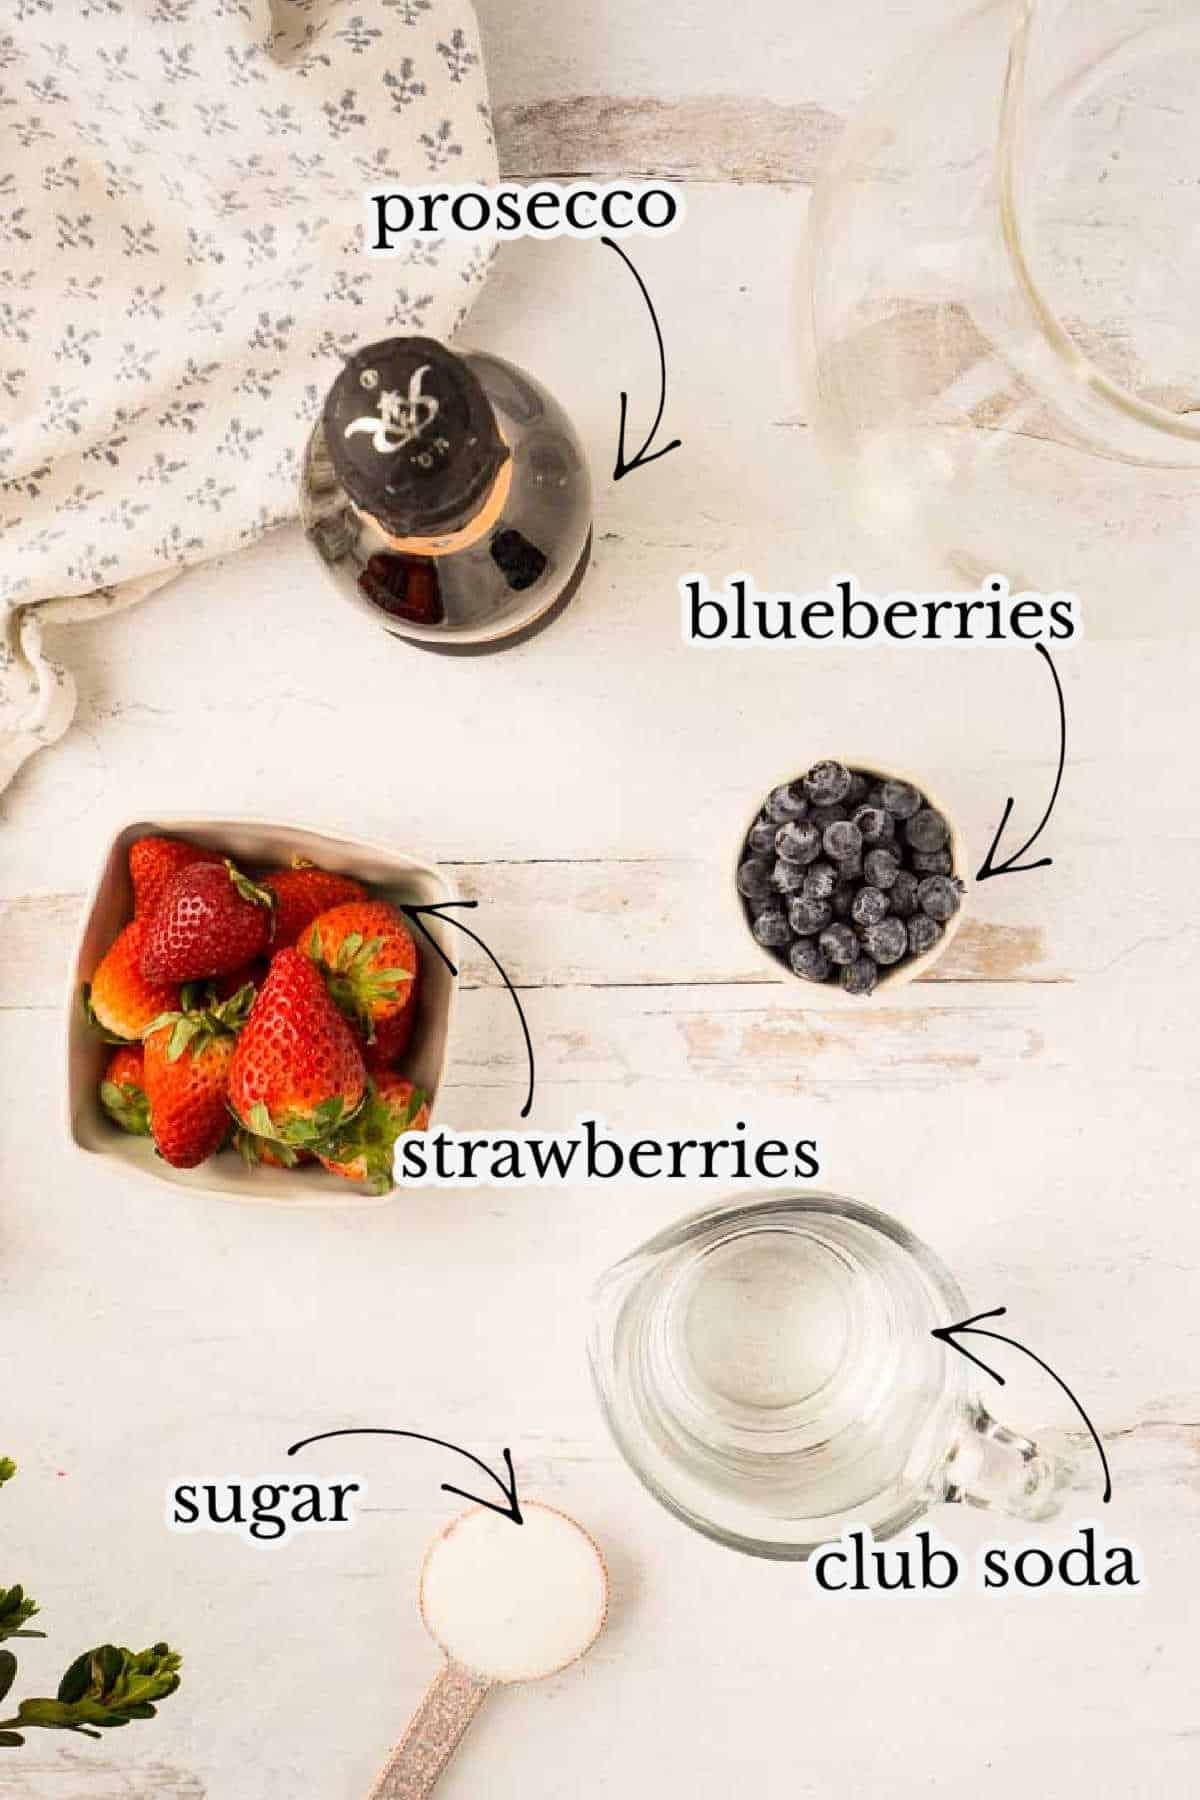 prosecco, blueberries, strawberries, club soda, and sugar